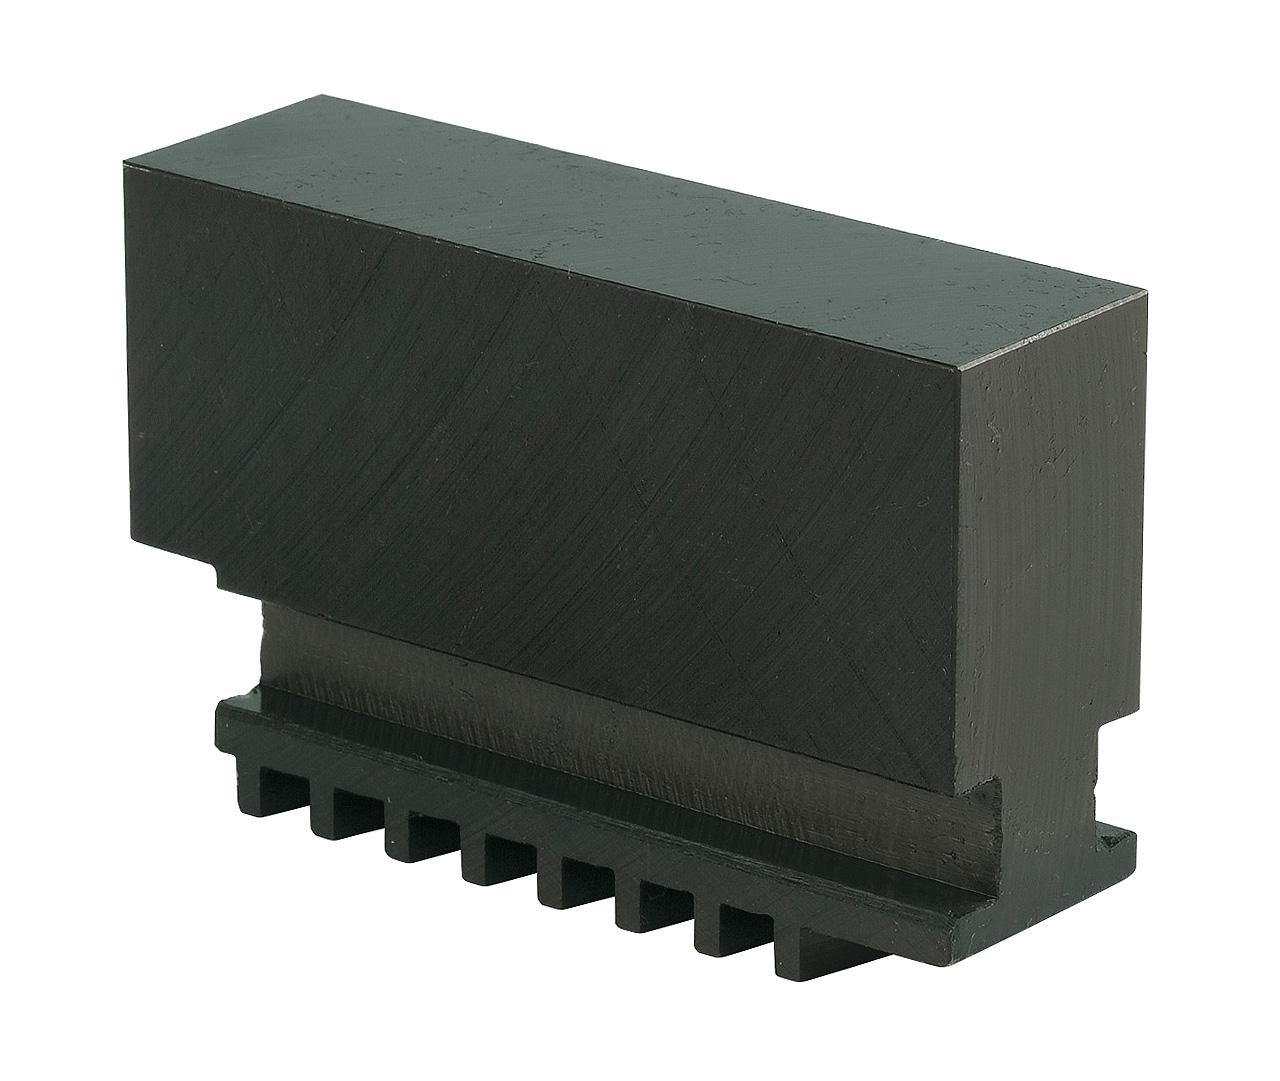 Szczęki jednolite miękkie - komplet DSJ-DK11-250 BERNARDO